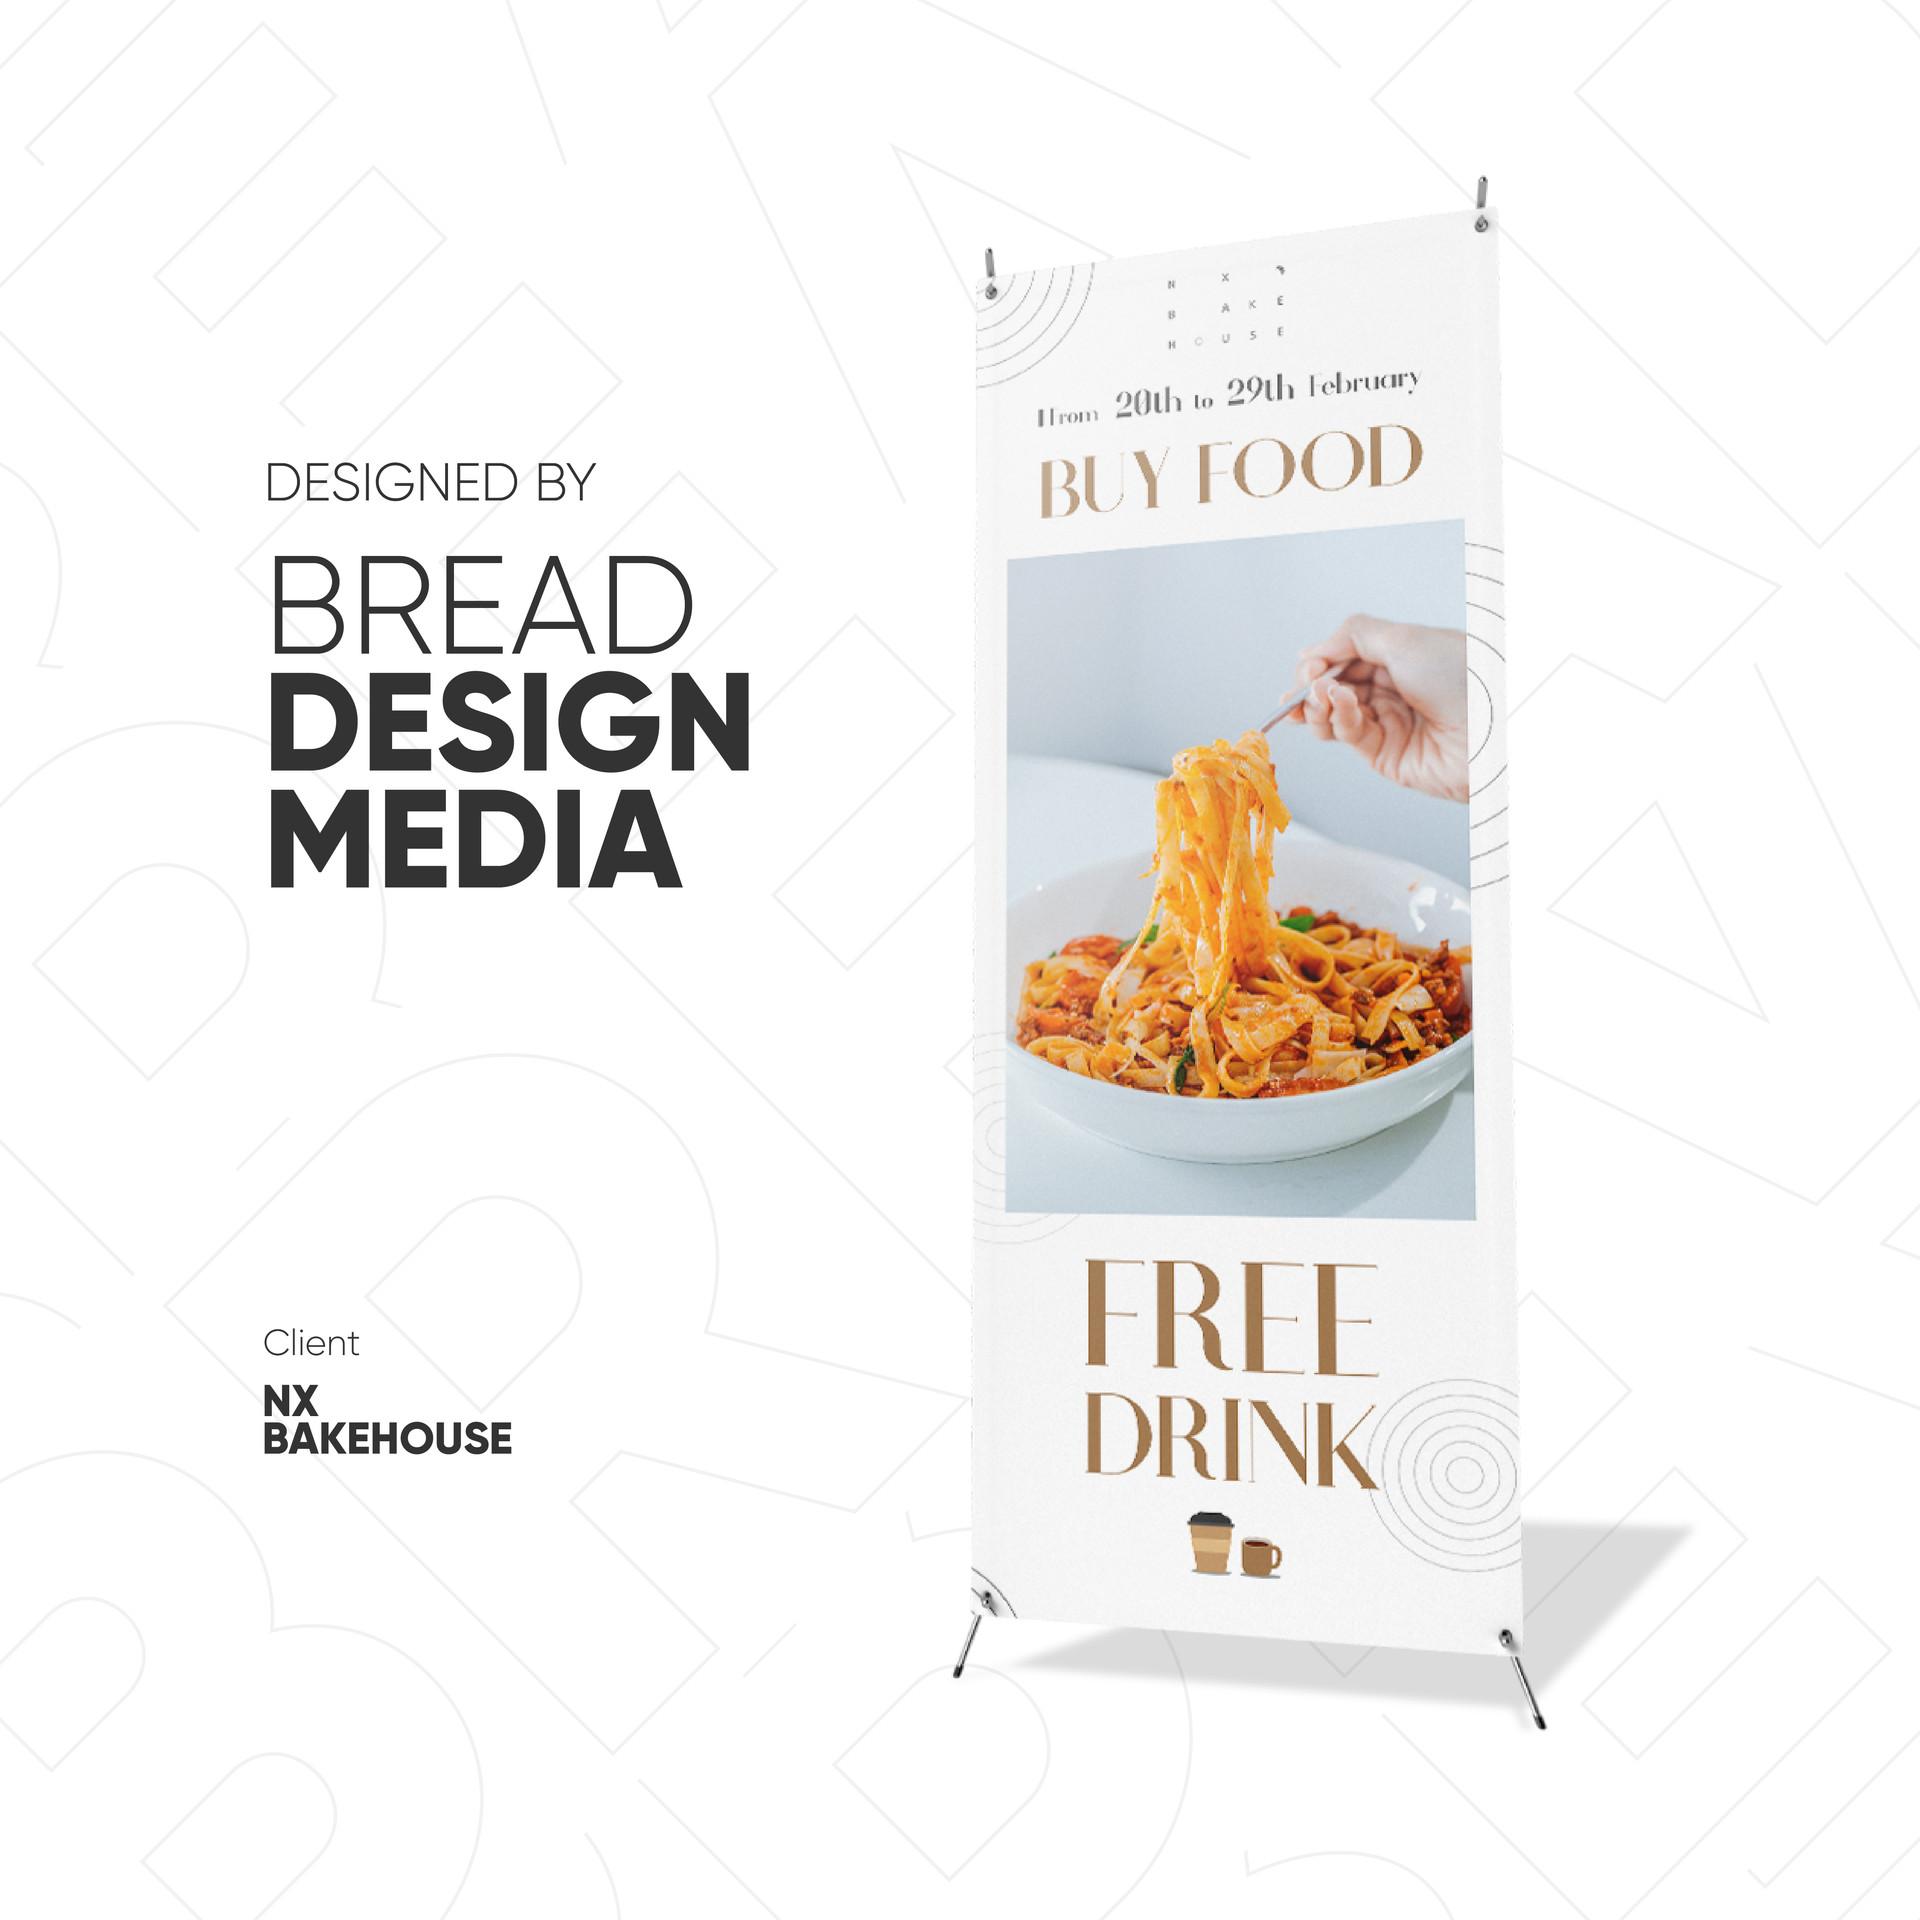 Designed By breaddesignmedia.jpg